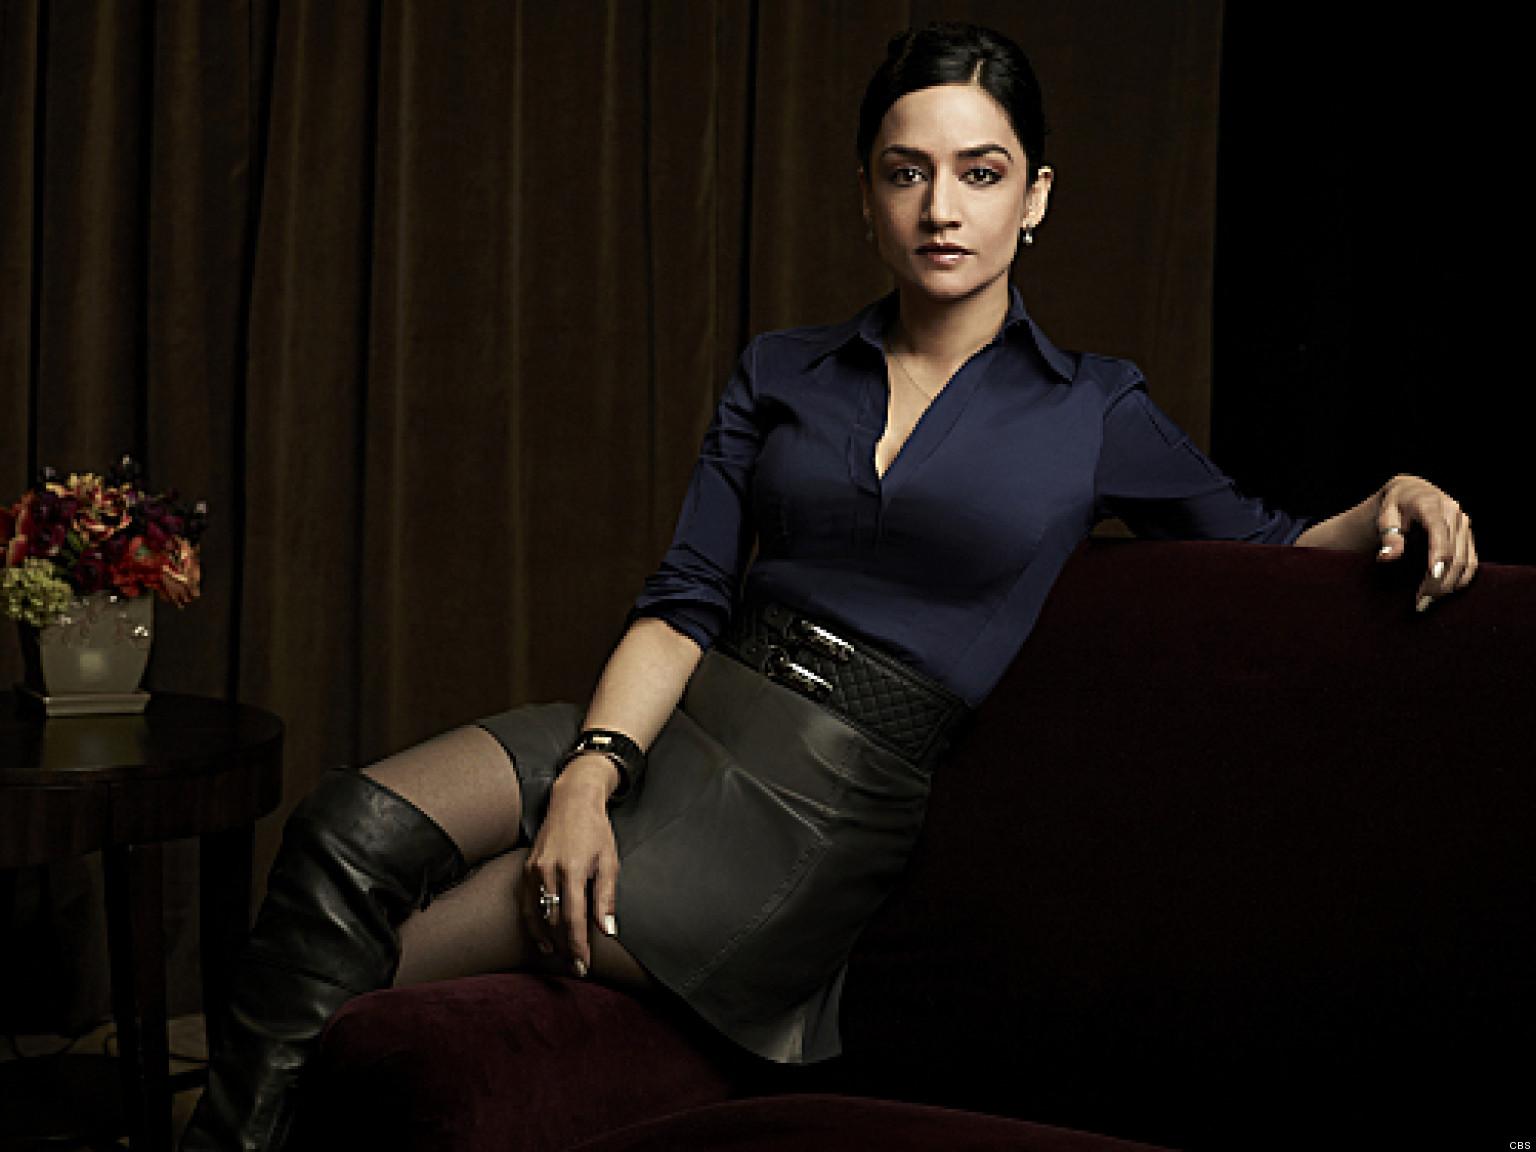 the good wife kalinda kicks butt in season 4 premiere